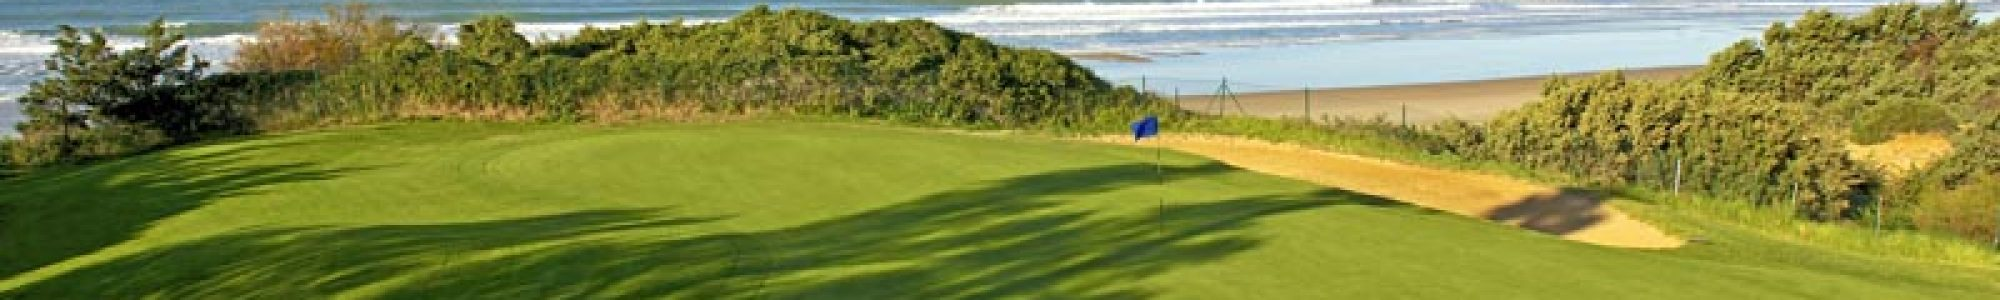 IBSTAR_GSP_Golf_D1304_009.jpg